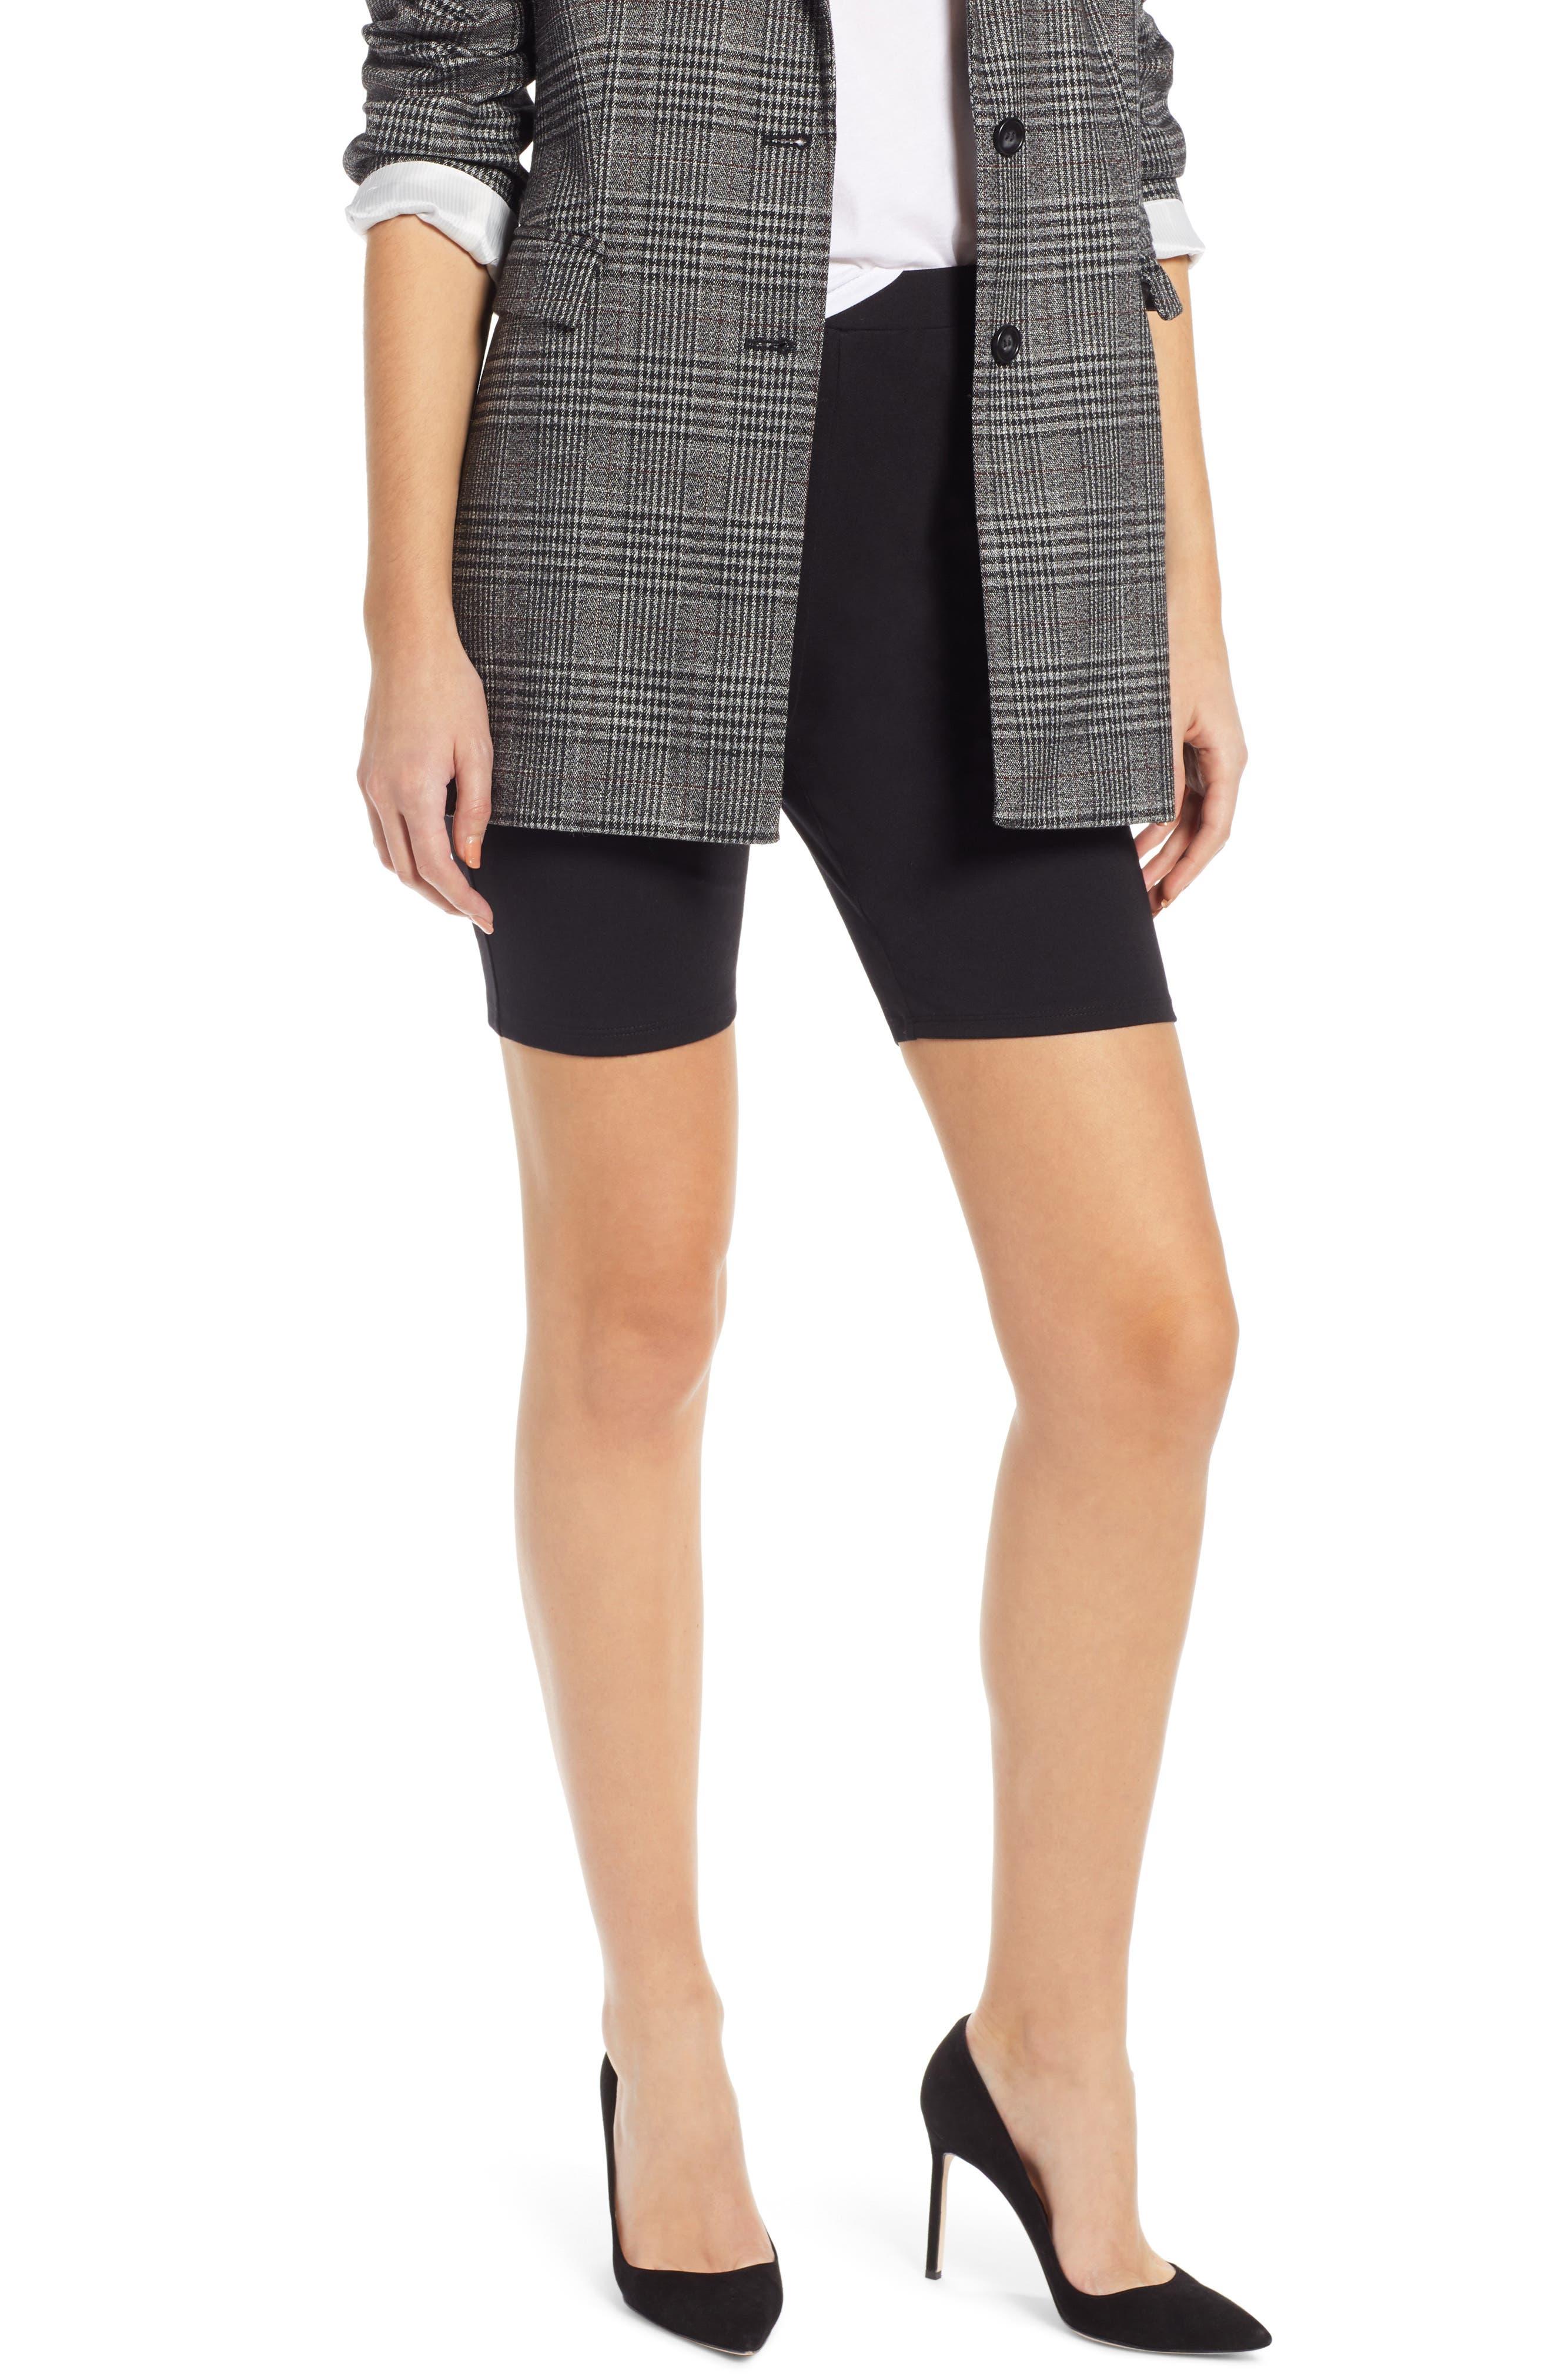 SOMETHING NAVY Bike Shorts, Main, color, 001